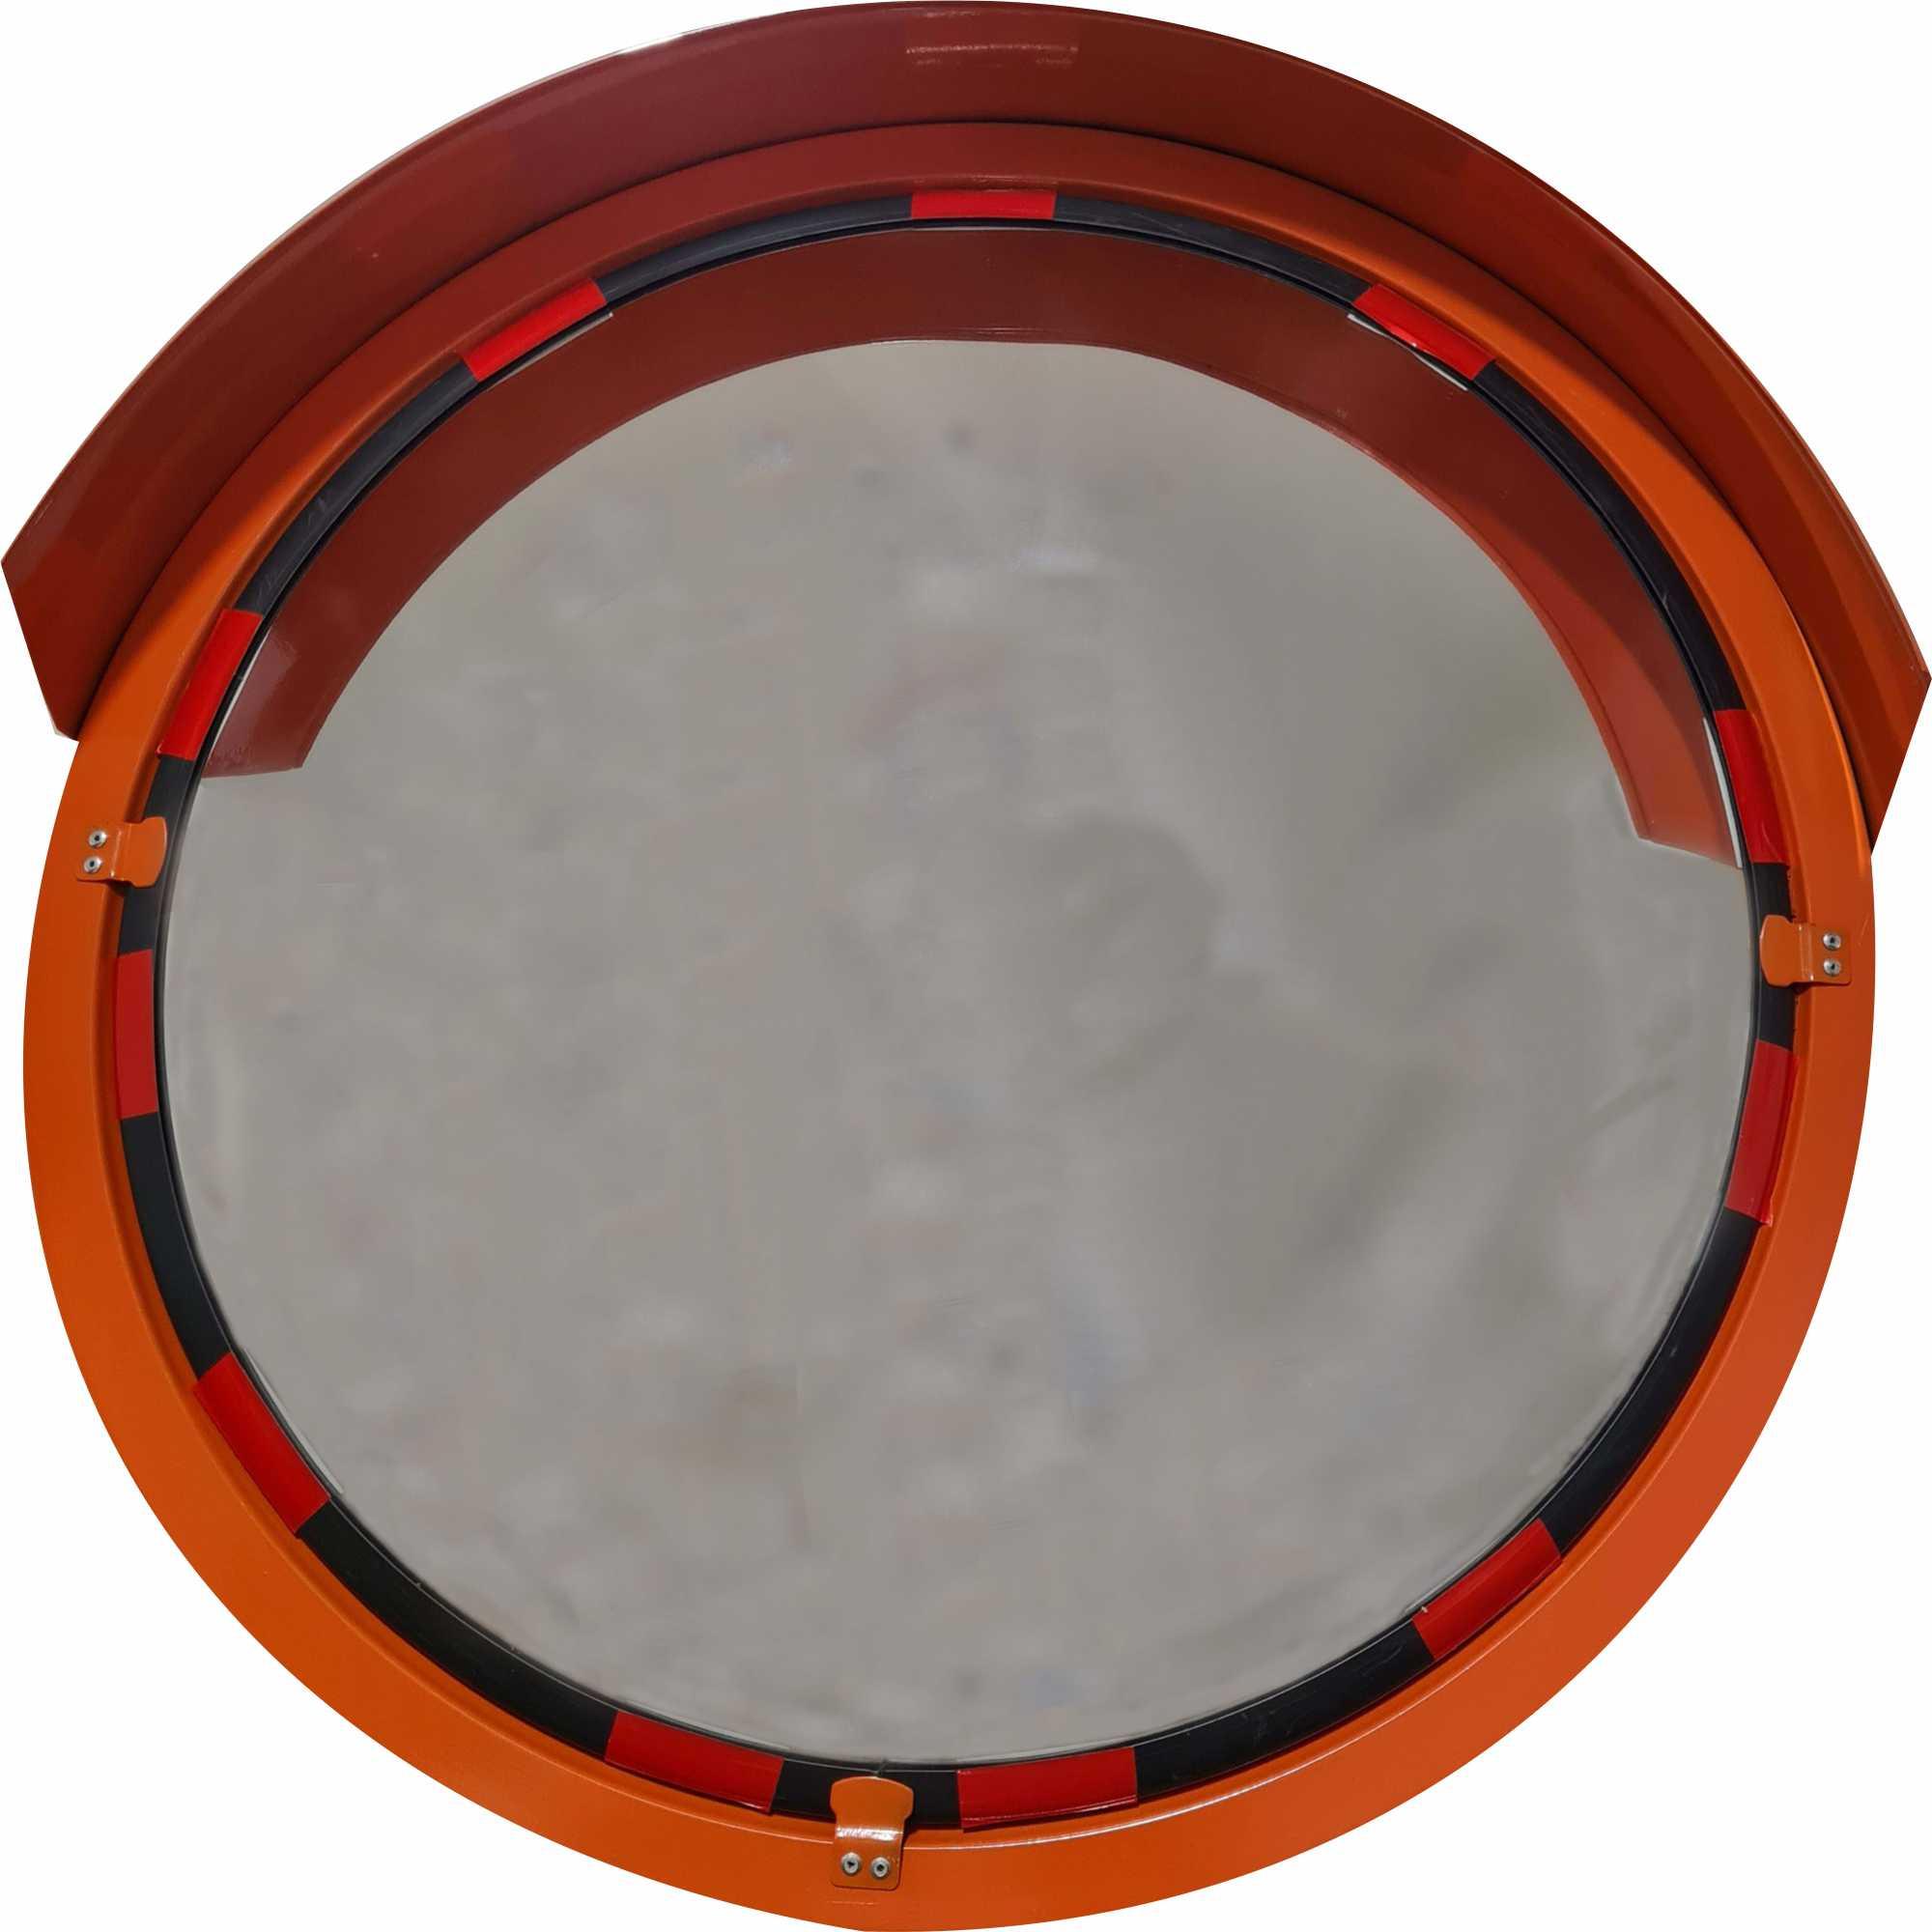 آینه محدب مدل 01 کد 88